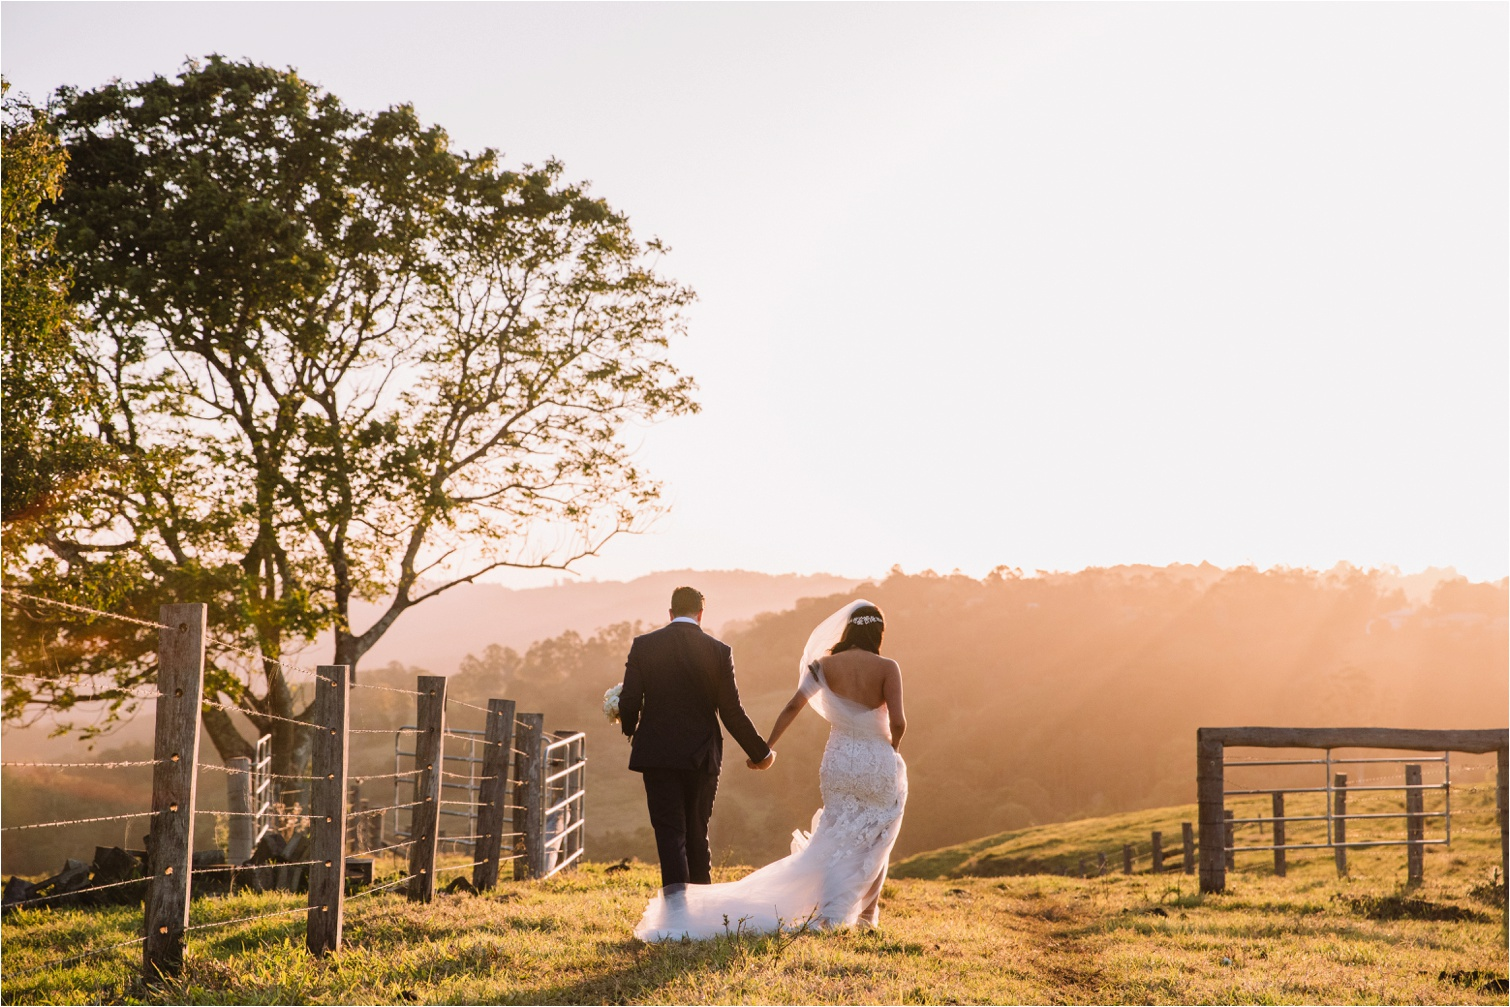 Maleny Manor Wedding Photography - Gold Coast Wedding Photographer_0045.jpg